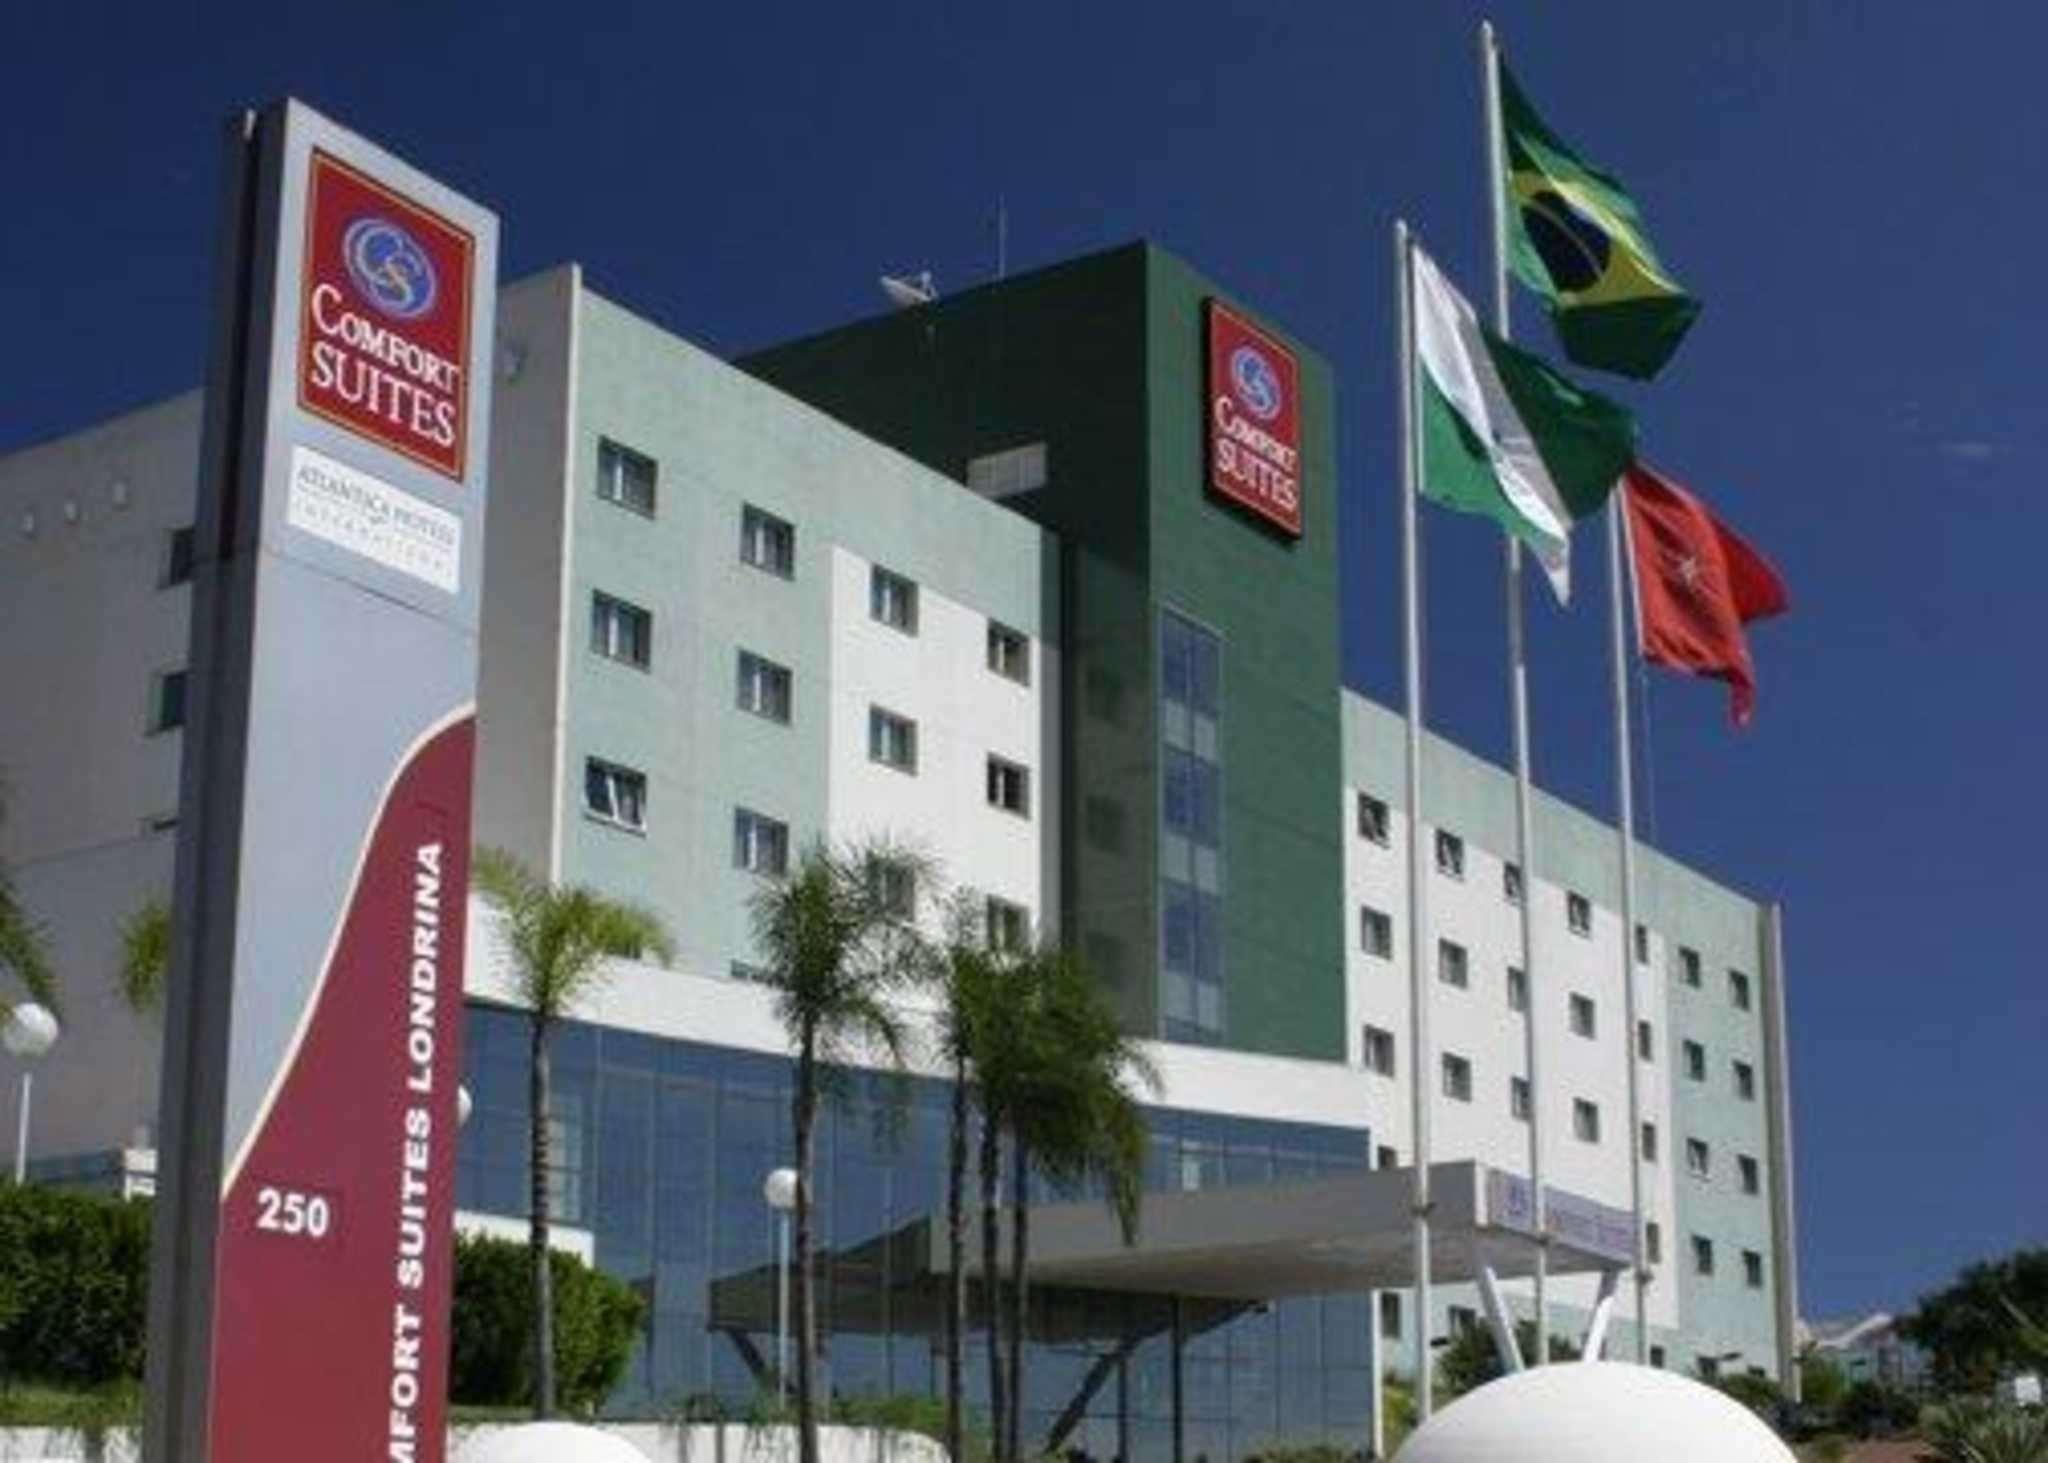 Comfort Suites Londrina Londrina